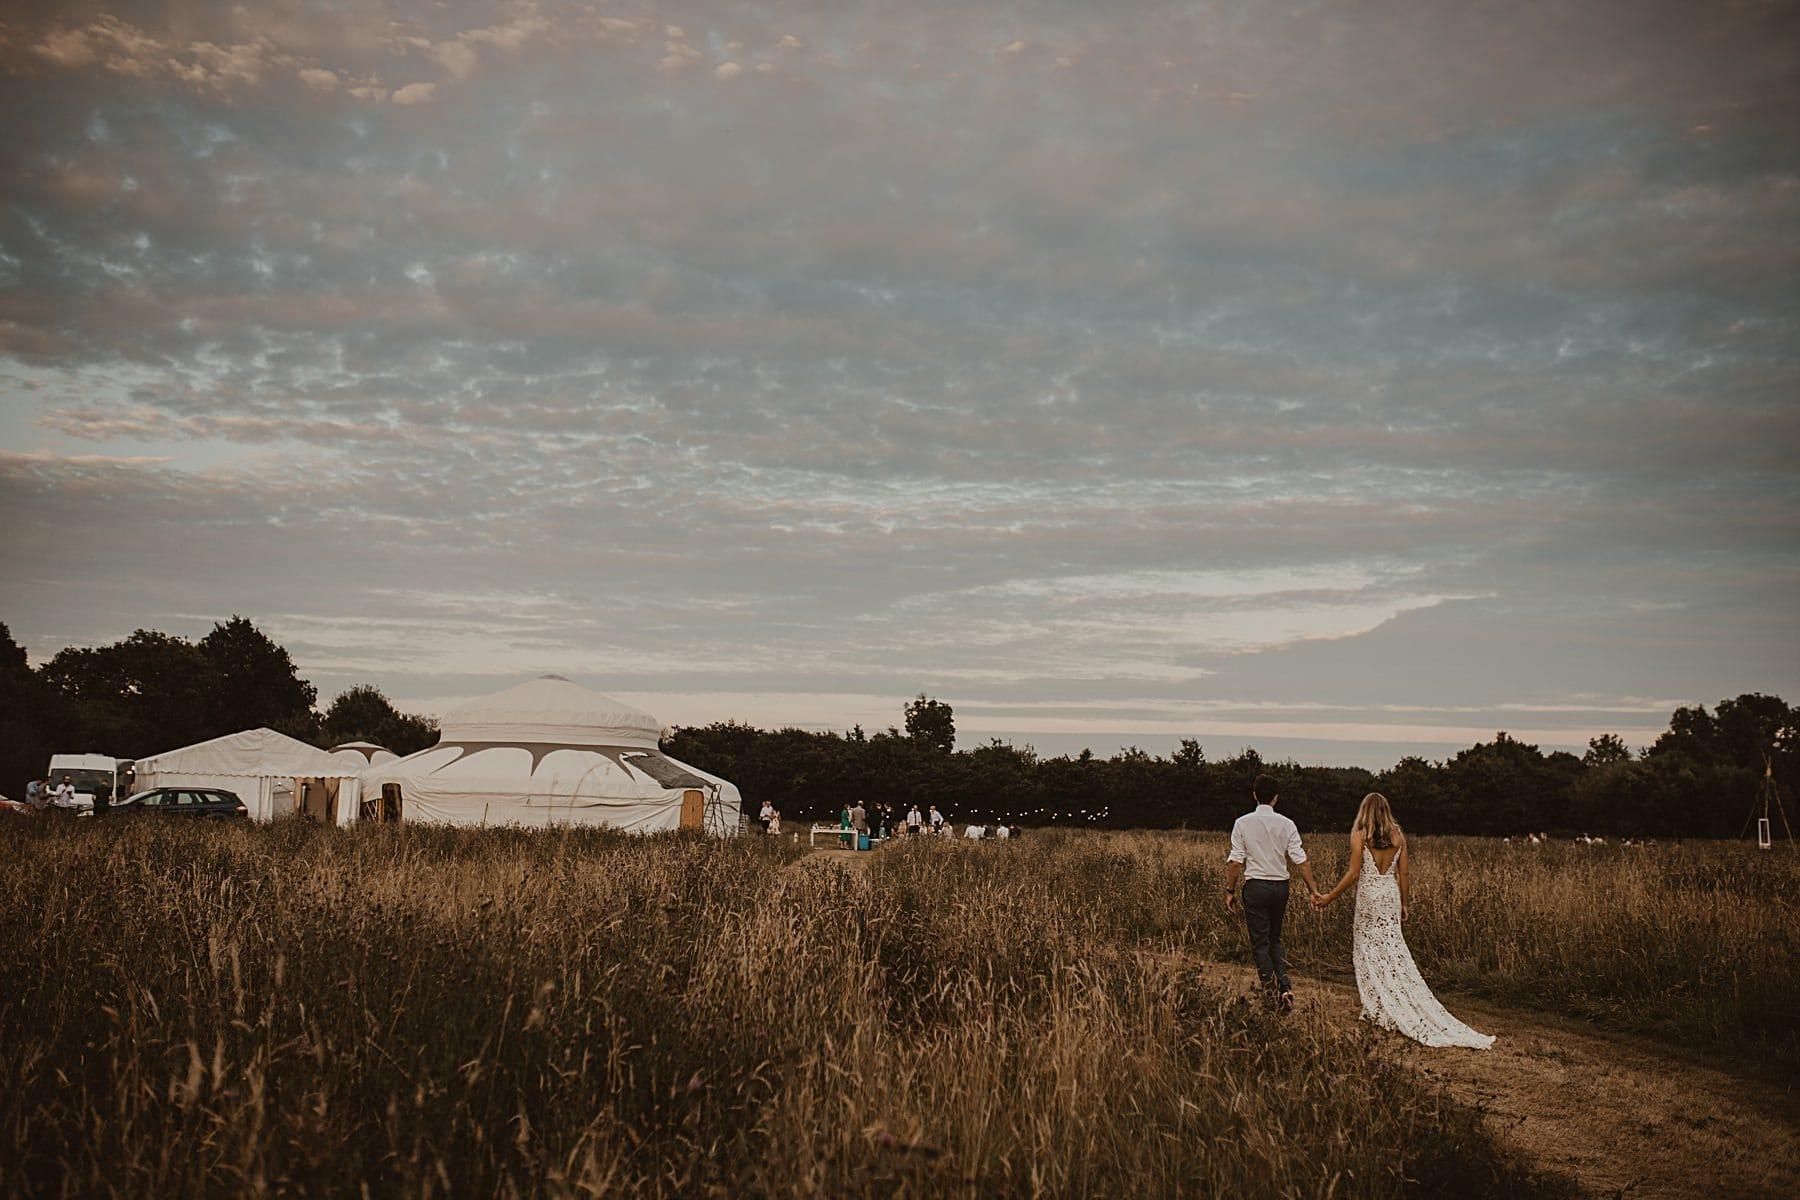 Bride and Groom walking to yurt, sunset